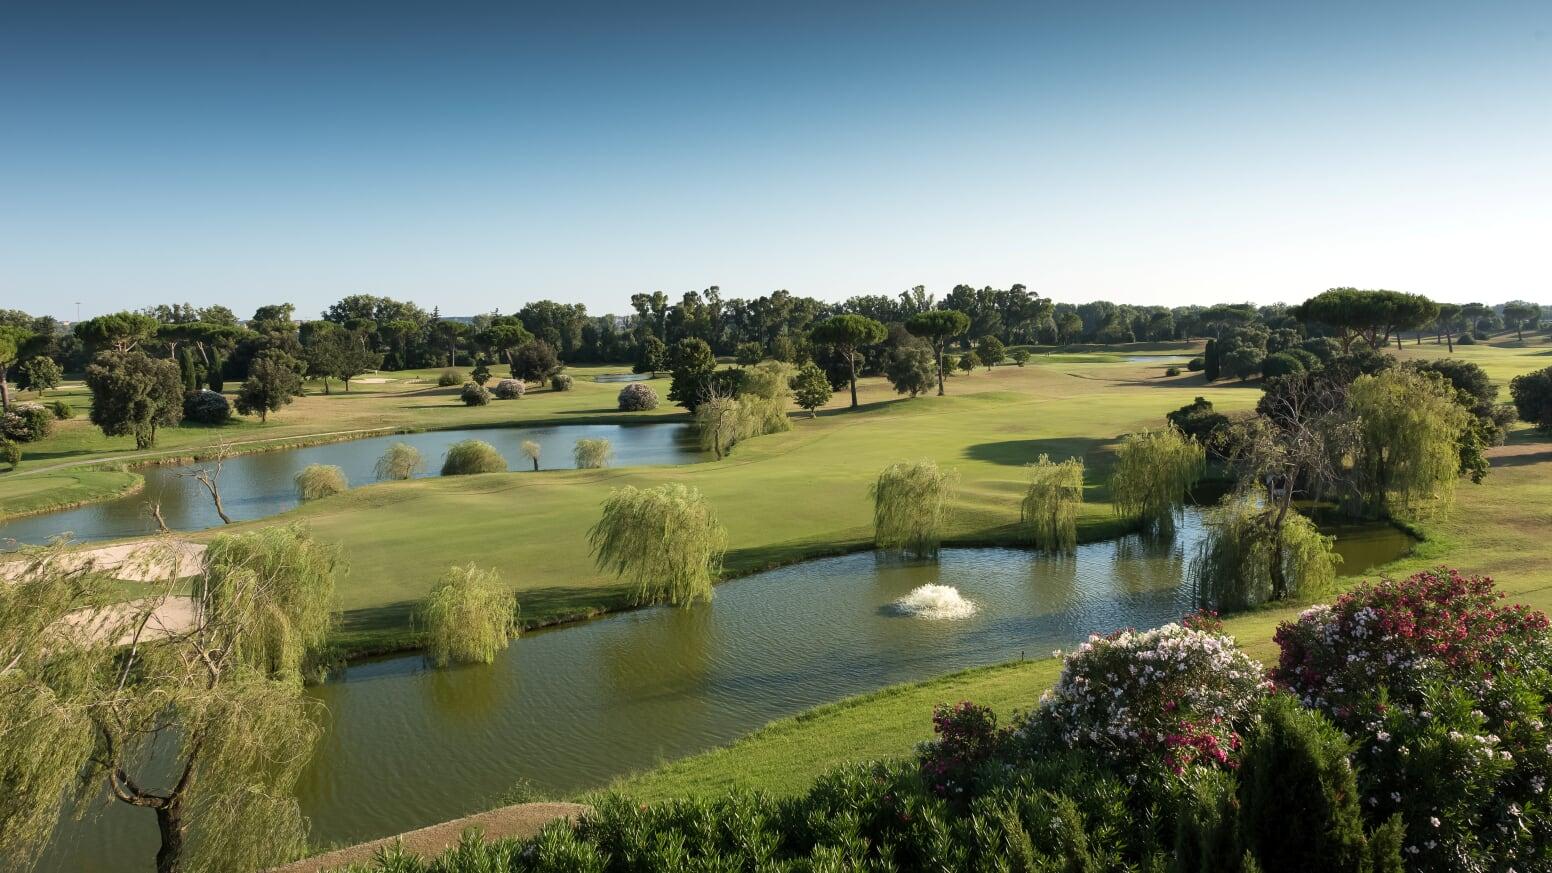 Golf Parco golfbana2